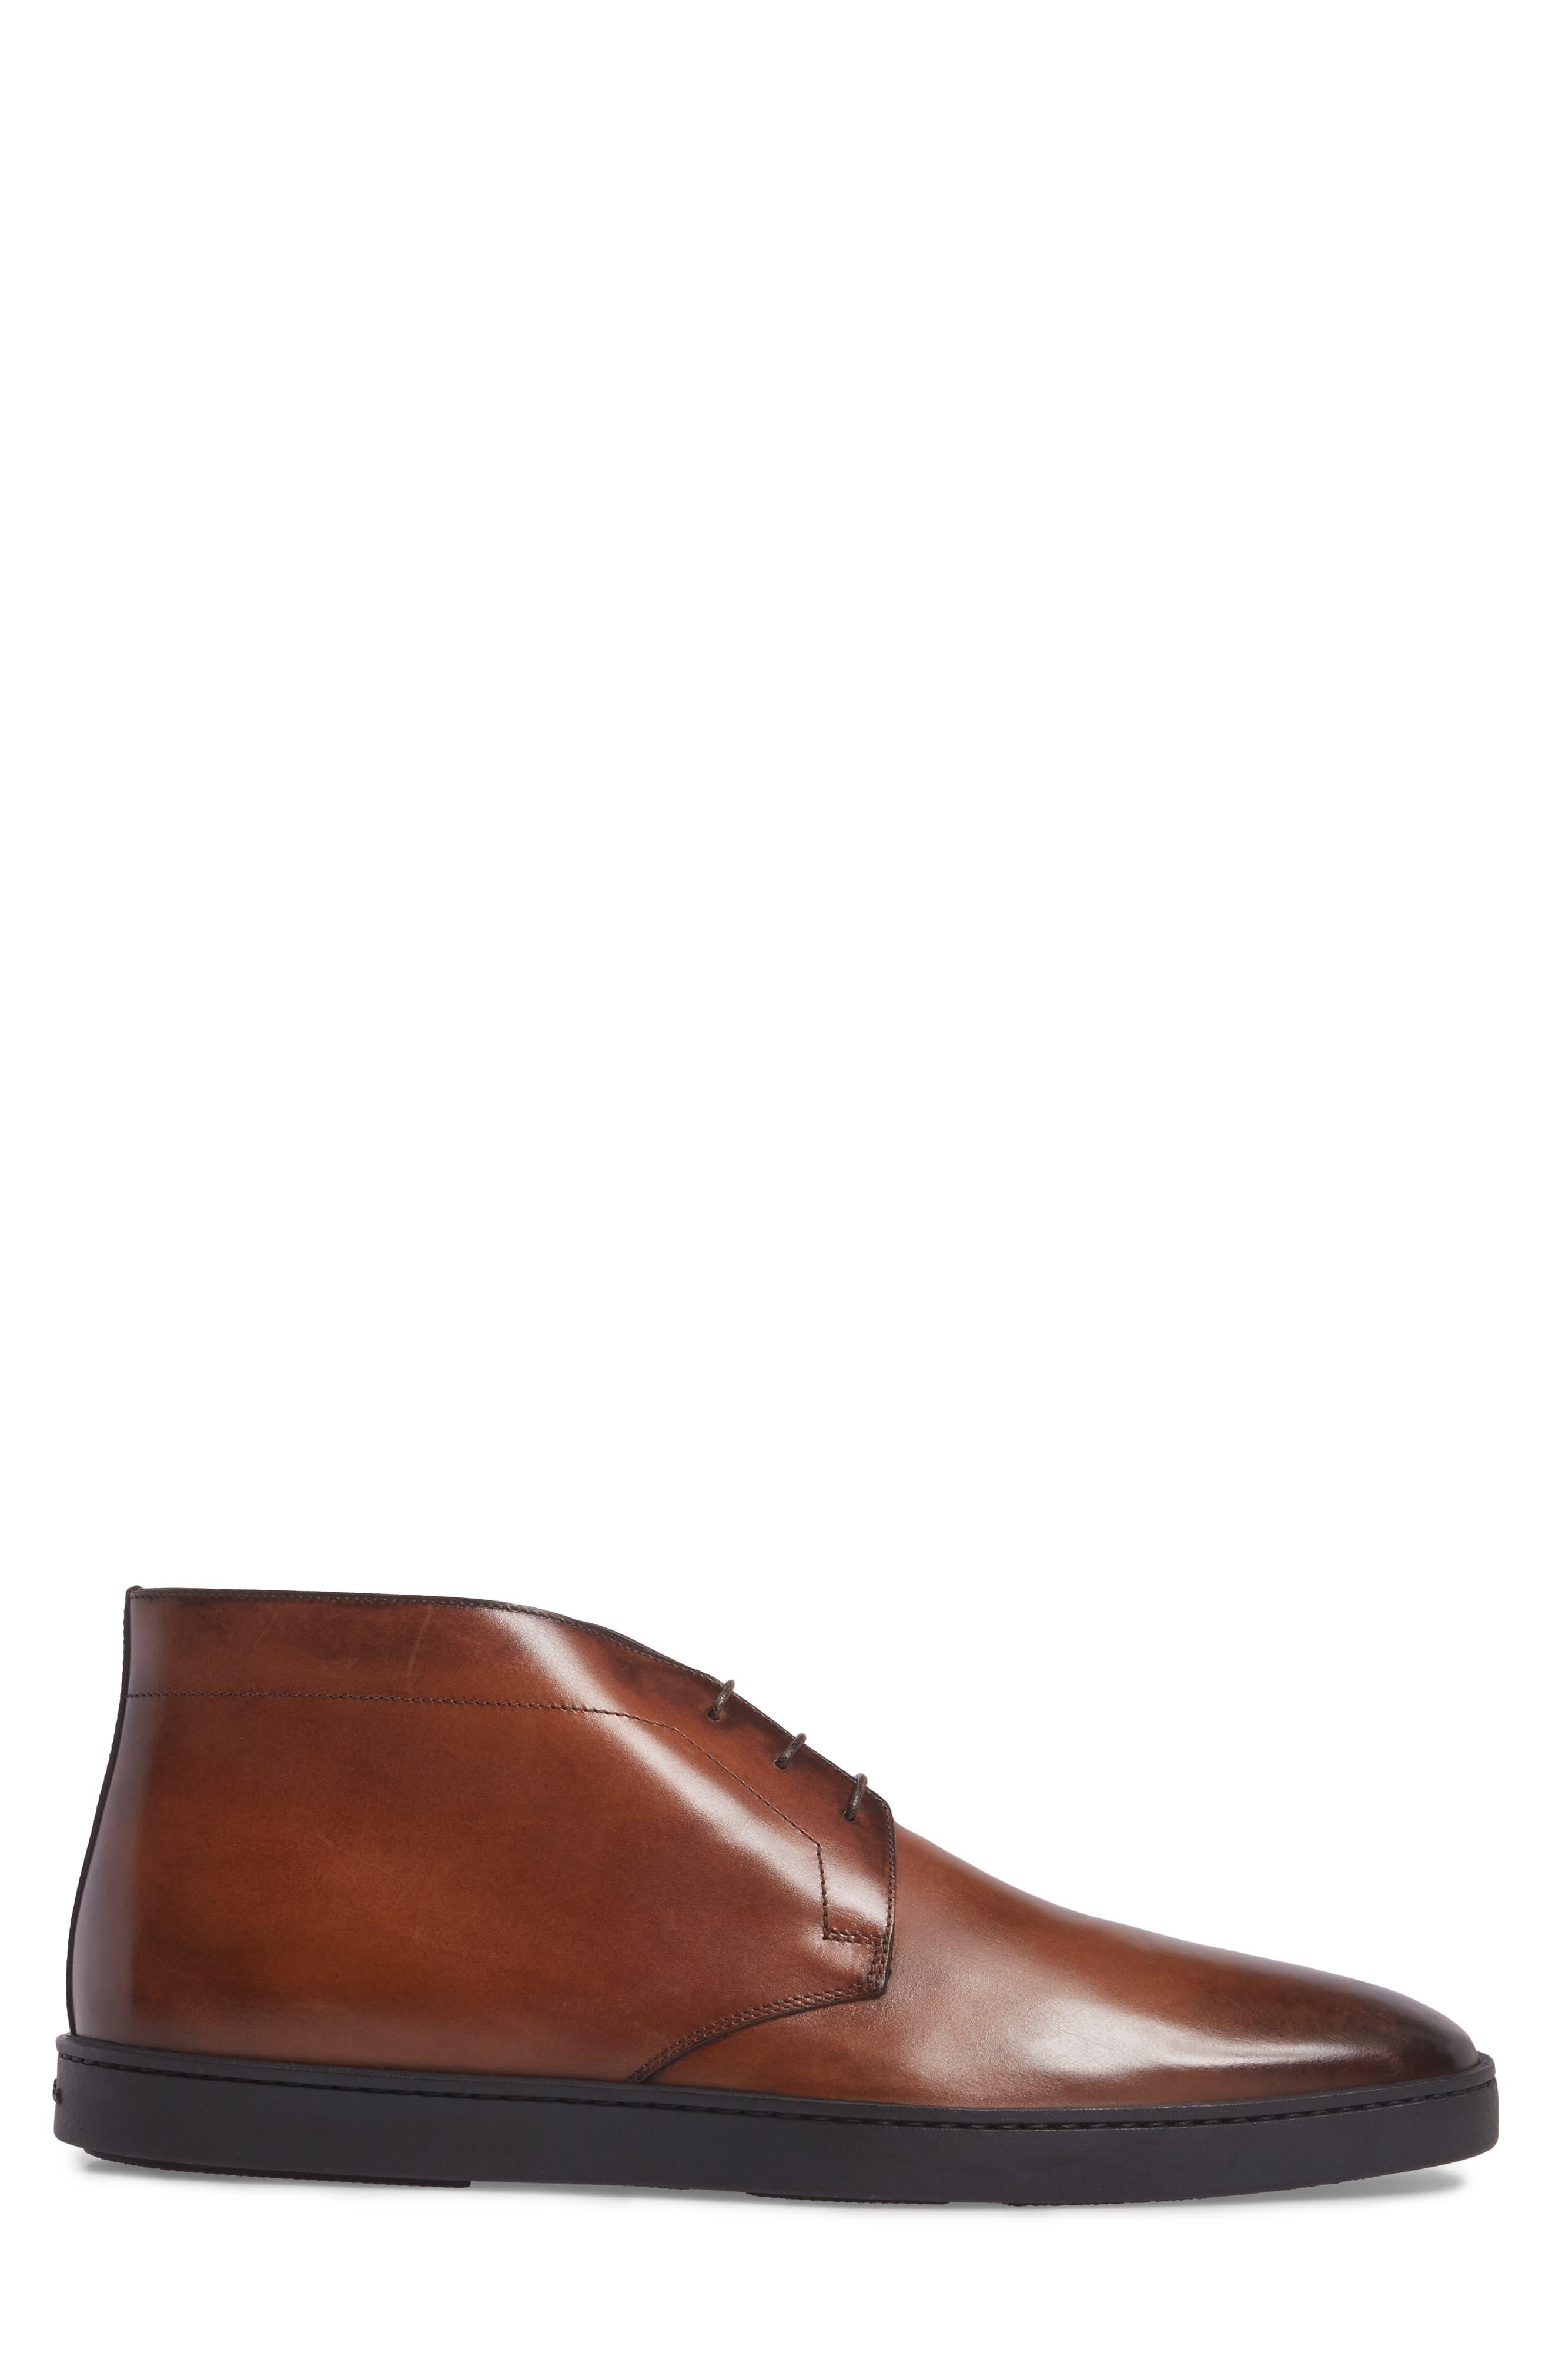 Eddy Chukka Sneaker Boot,                             Alternate thumbnail 2, color,                             Brown